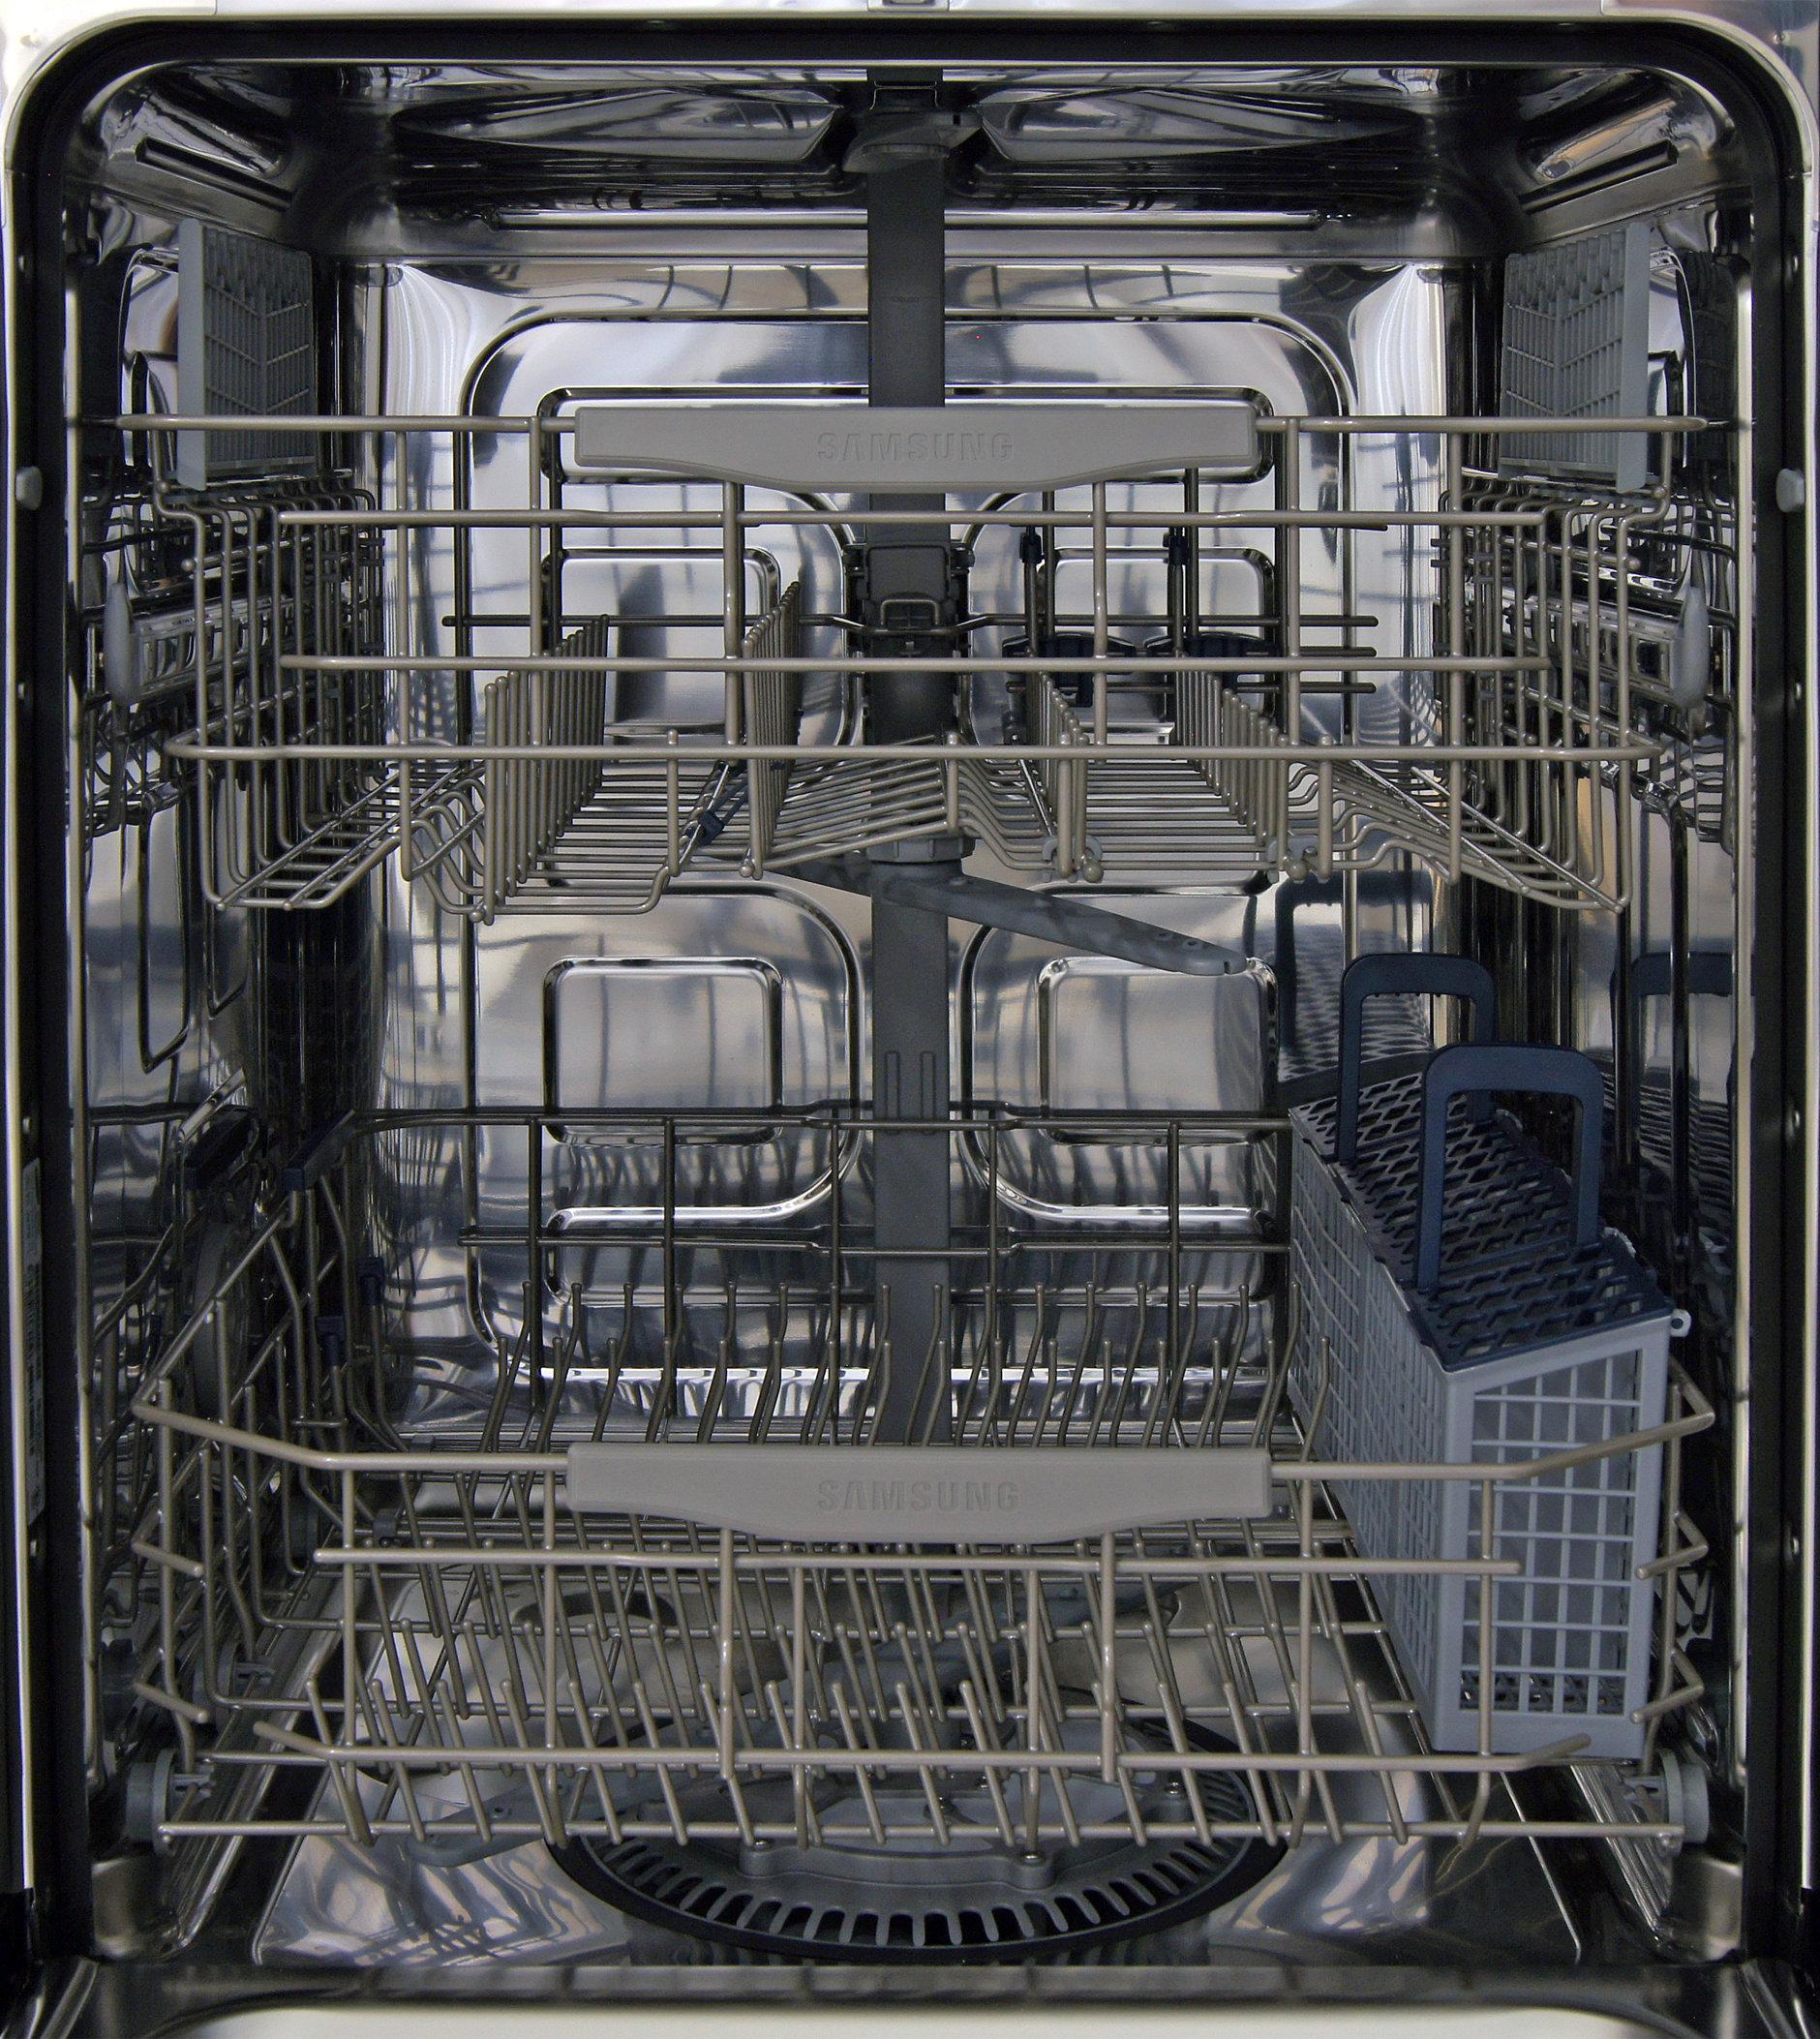 Interior of the Samsung DW80F600UTS